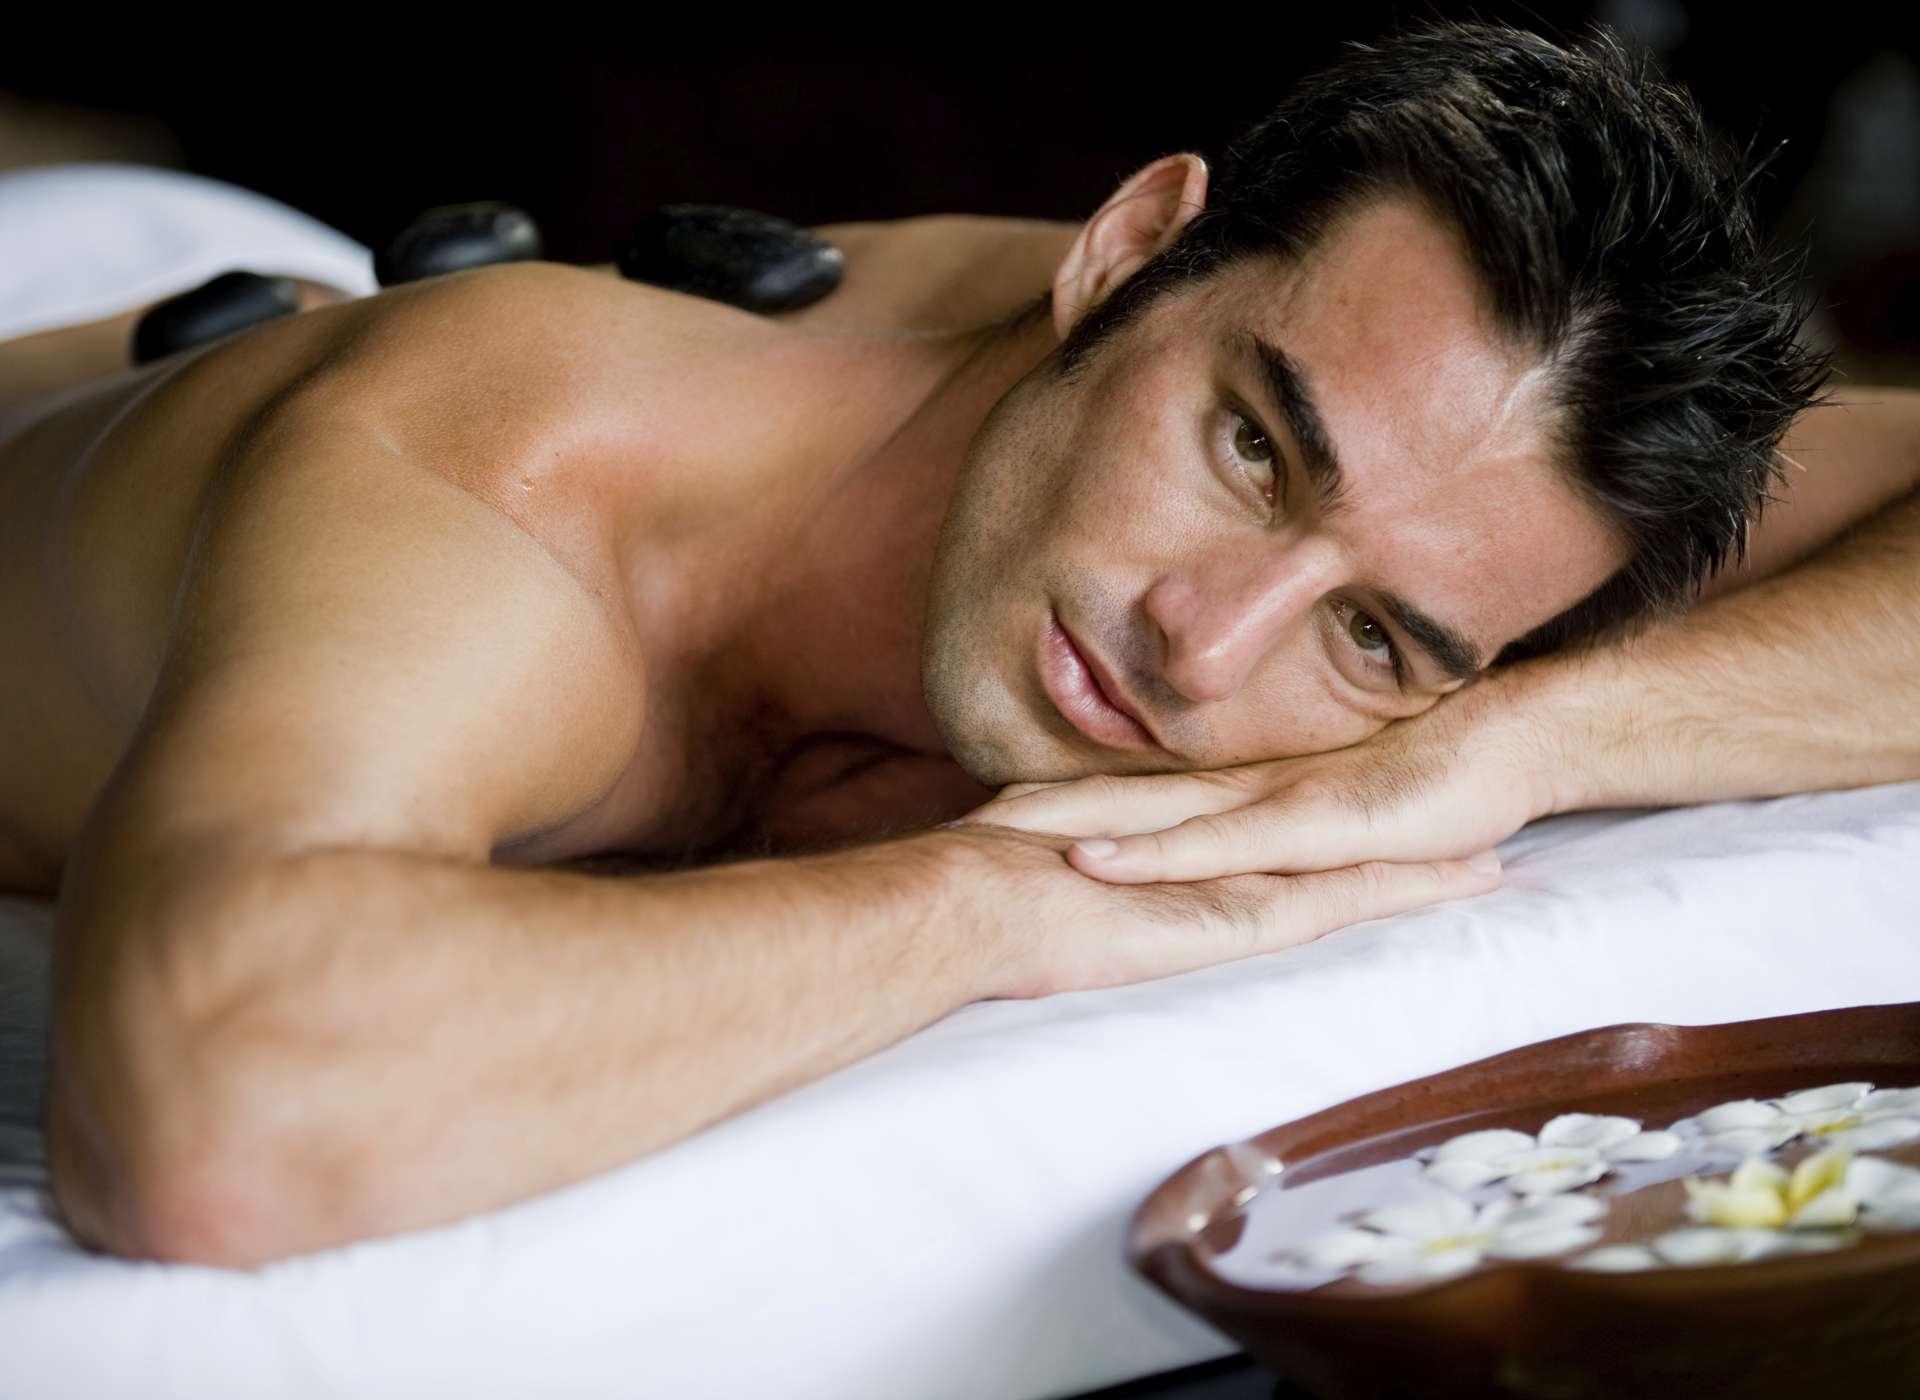 Hot Stone Massage im Wellnesshotel Alpen-Karawanserai - 1191520